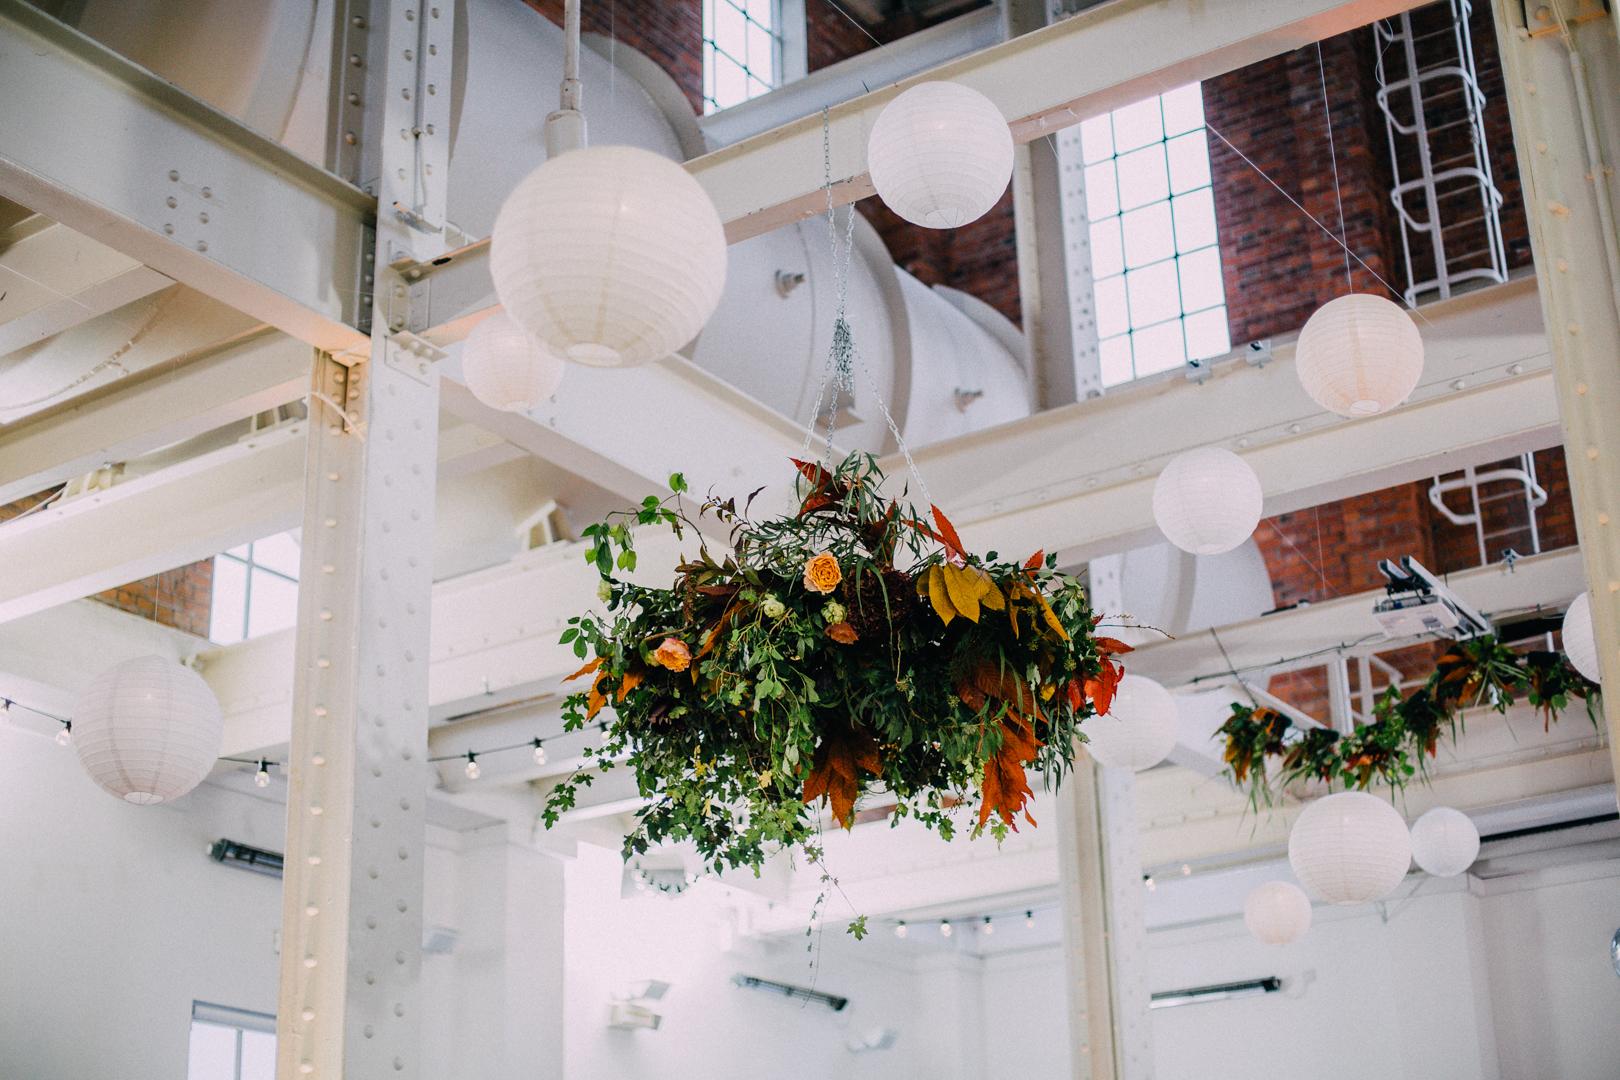 Quirky Venue, Non-traditional wedding planner, London Wedding coordination, Bespoke weddings, Stoke Newington Wedding, Herbert & Isles, non-formal, Stylish wedding